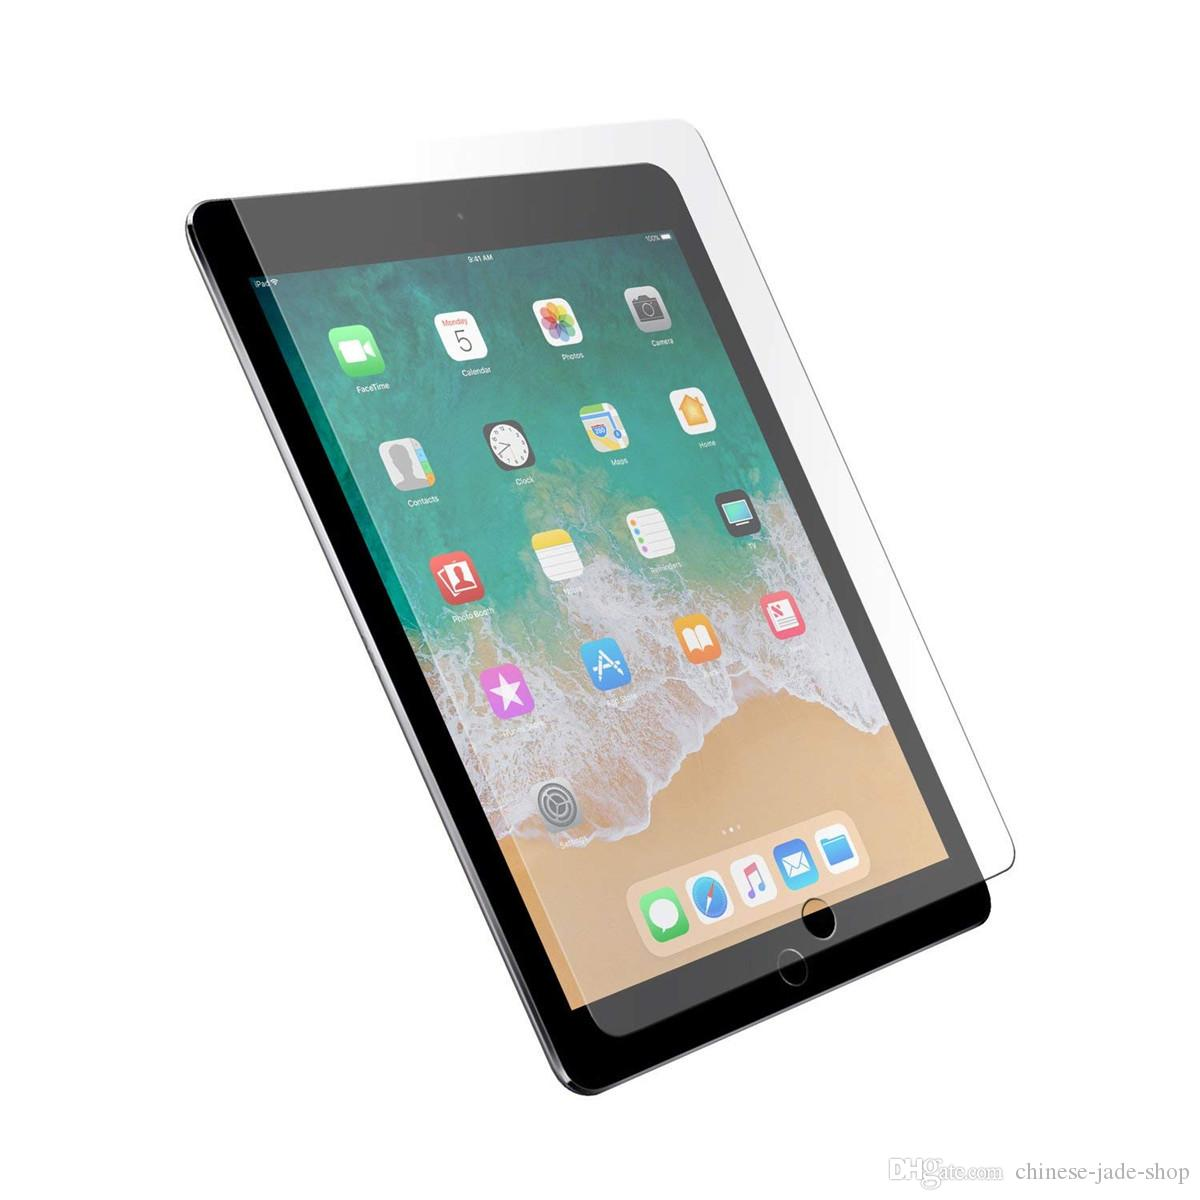 9H Protecteur d'écran en verre trempé pour iPad 10.2 2019 1/2/3 AIR 1 AIR 2 iPad 2017 2018 Pro 10.5 iPad Pro 11 Pas de colis 500pcs / lot